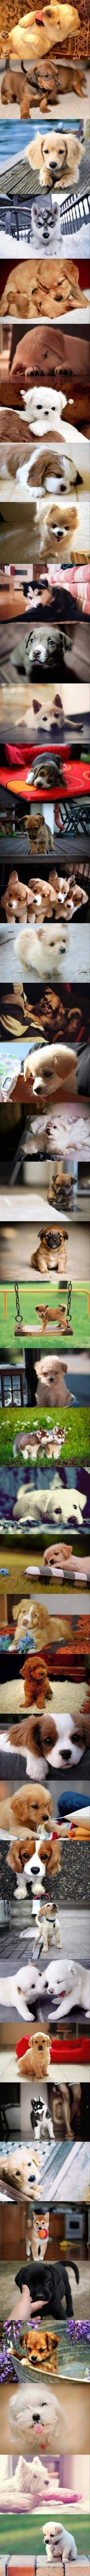 Cutest Puppy Overload – 40 Pics